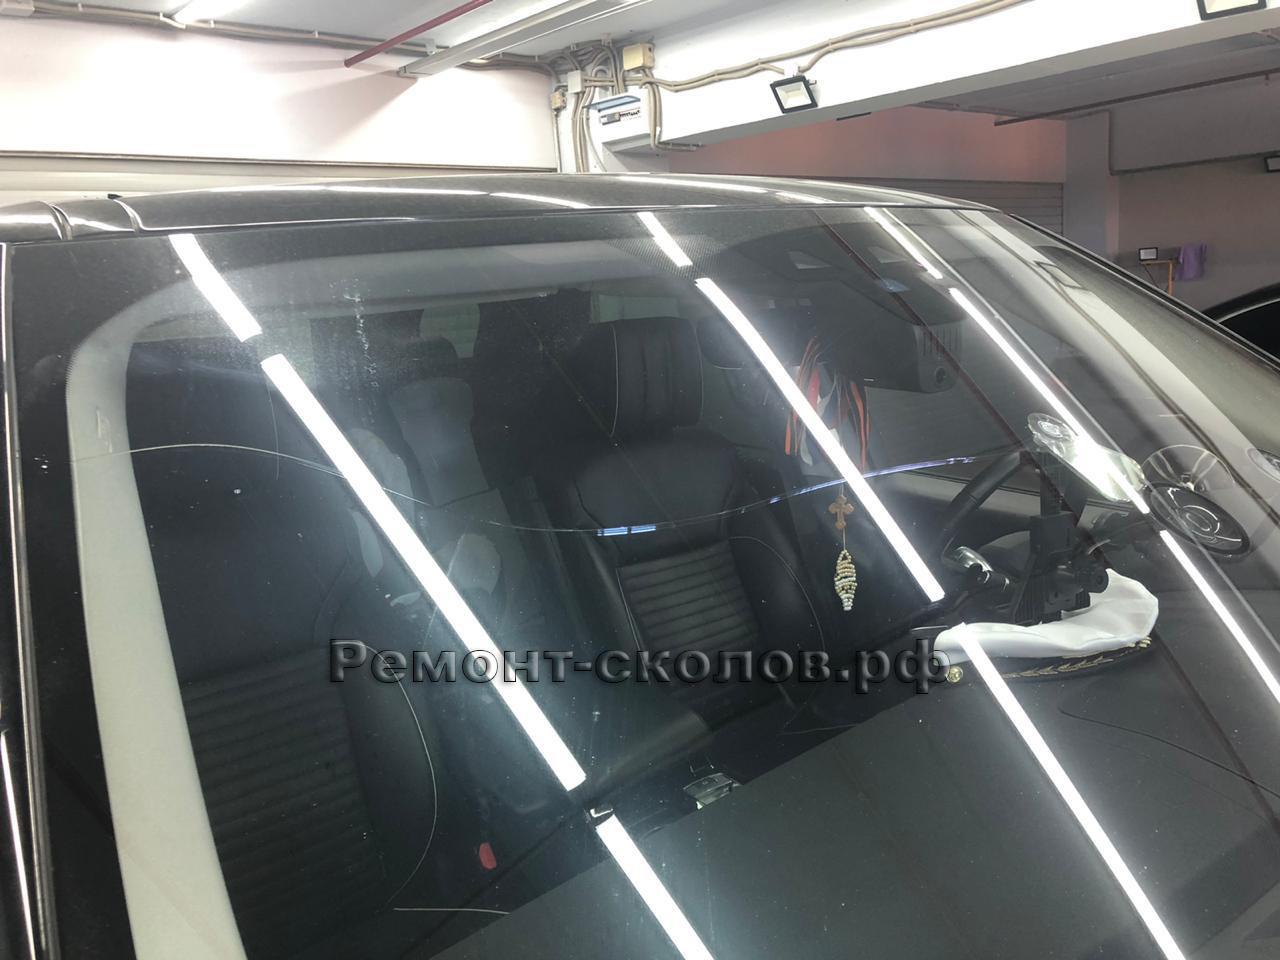 Процесс ремонта скола и трещины на лобовом стекле Land Rover Discovery в ЮЗАО